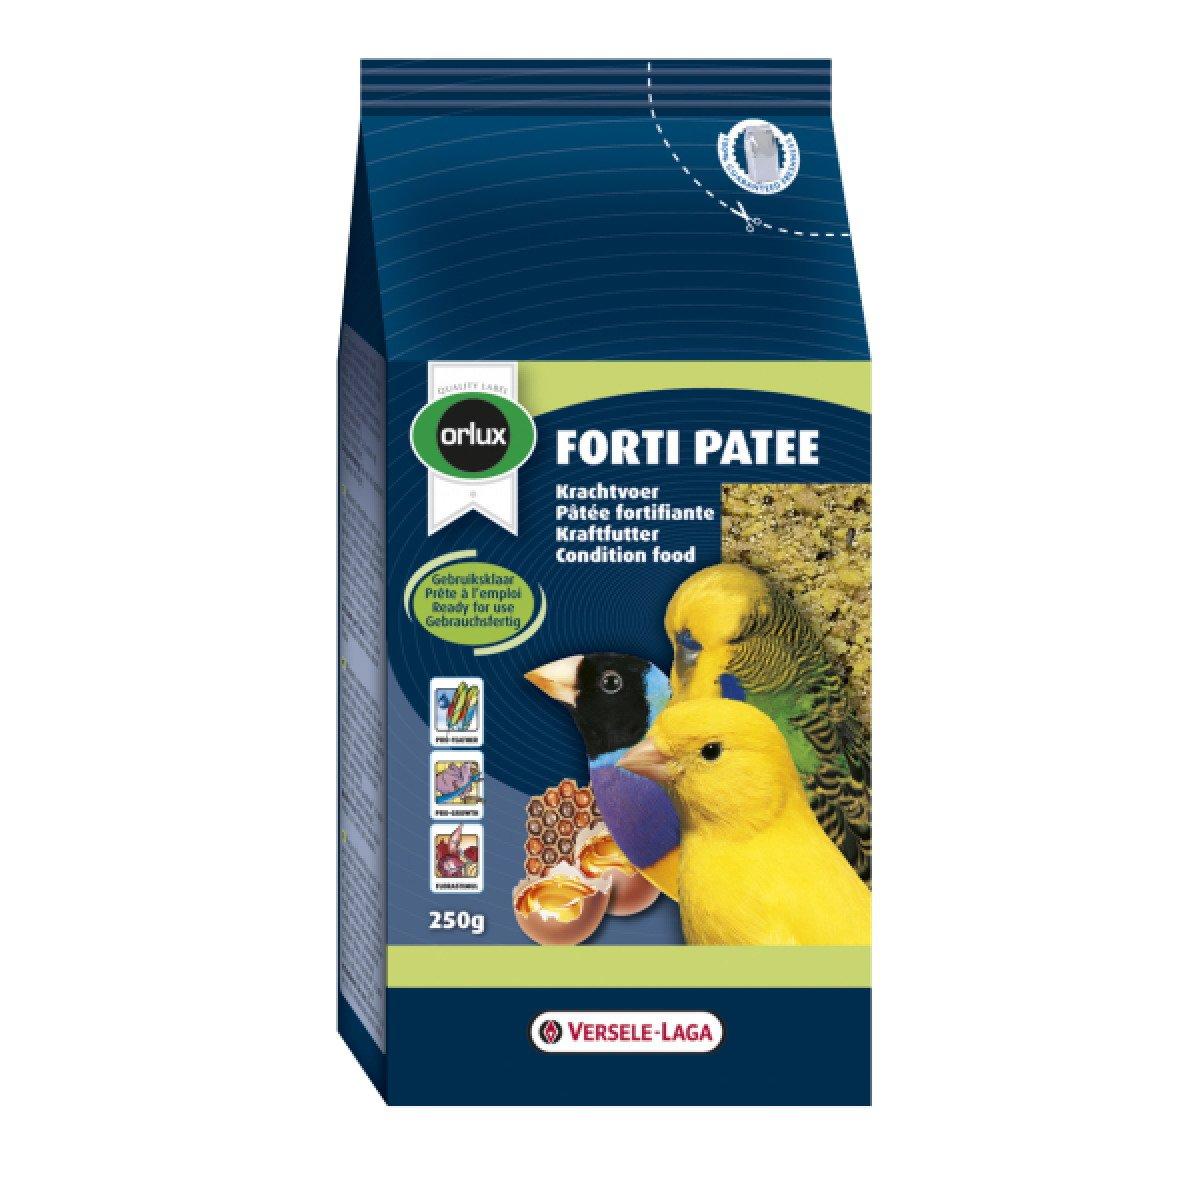 Orlux Forti Patee Kraftfutter - 250 g